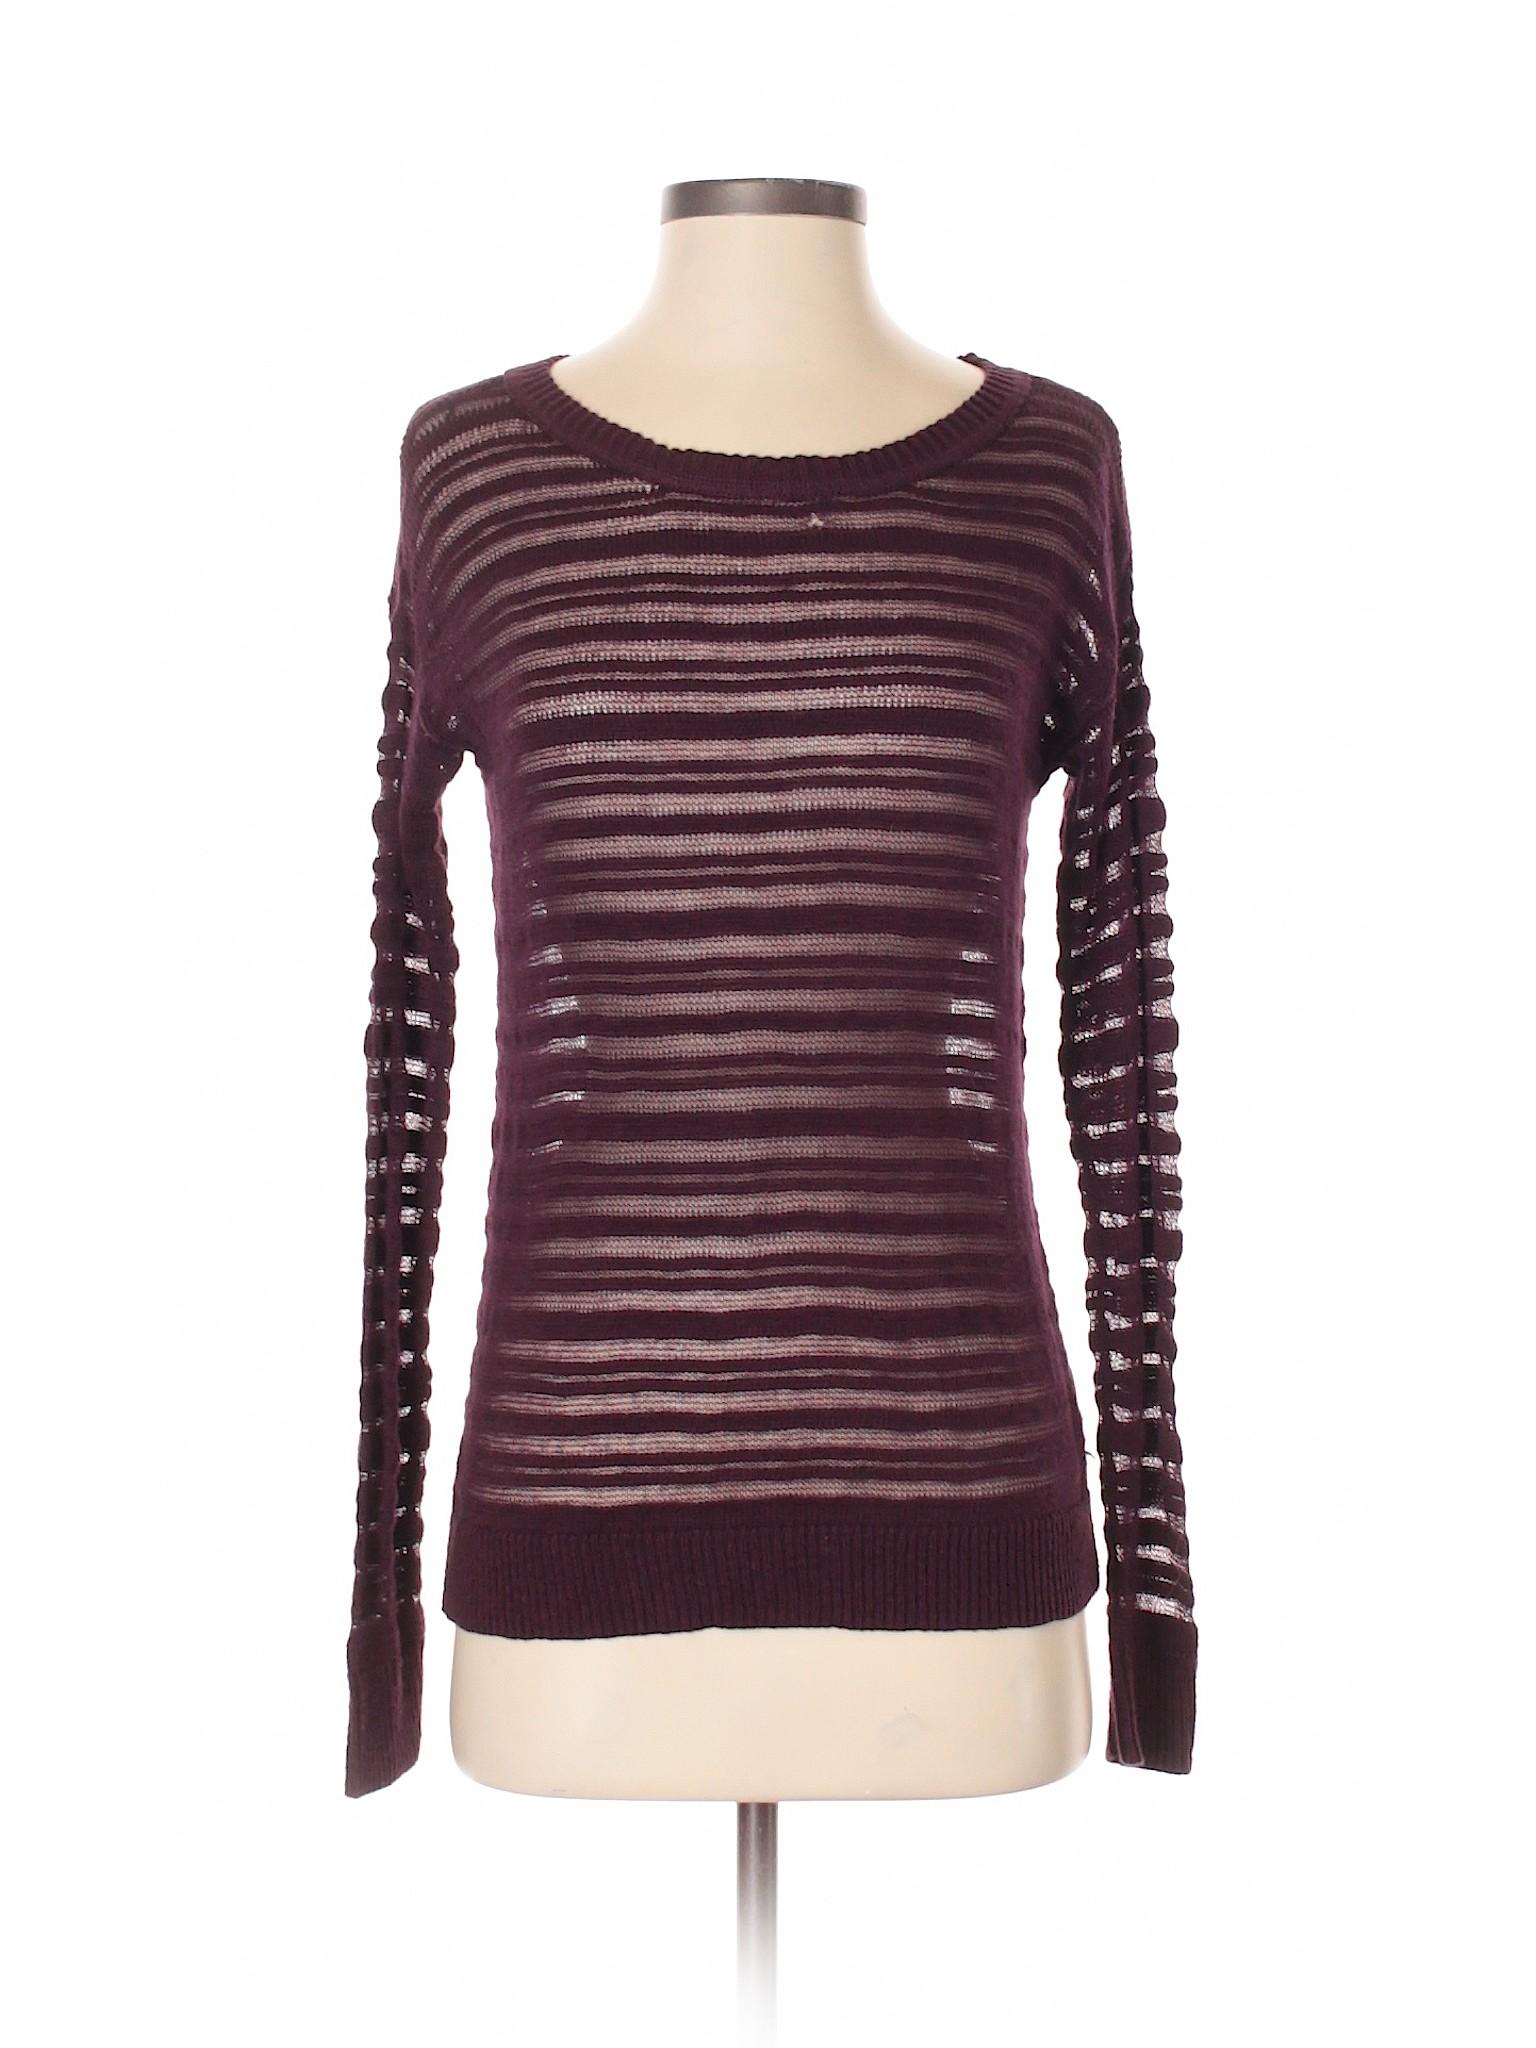 Boutique Ann Ann Taylor Pullover Taylor Sweater Boutique Boutique Sweater Pullover vfqZqTWO